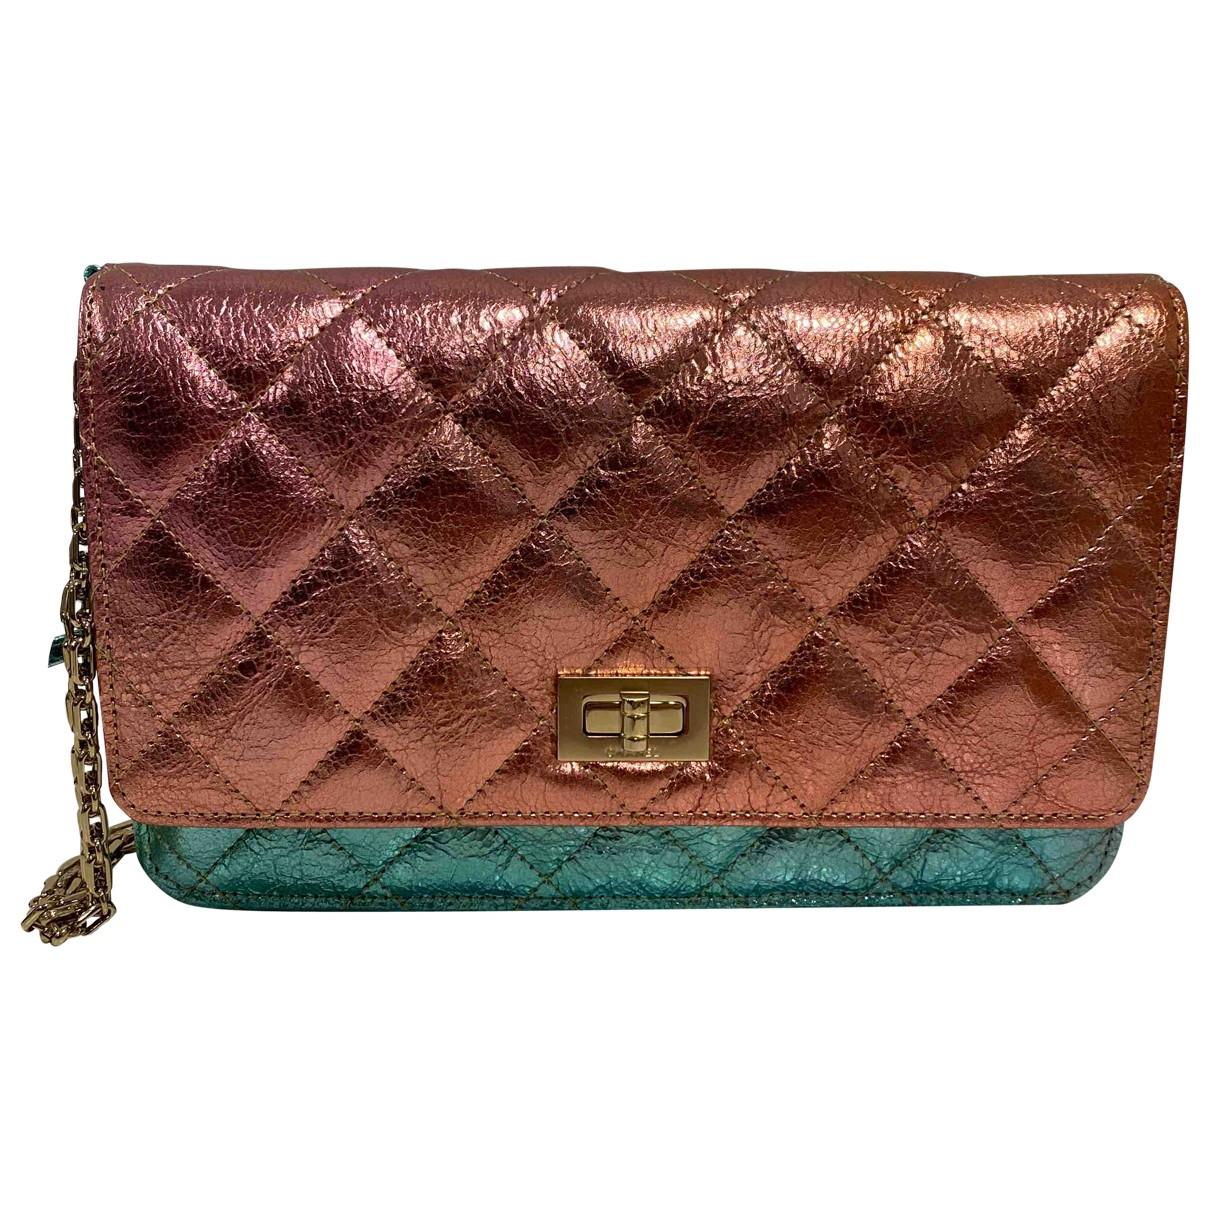 Chanel Wallet on Chain Handtasche in  Bunt Leder